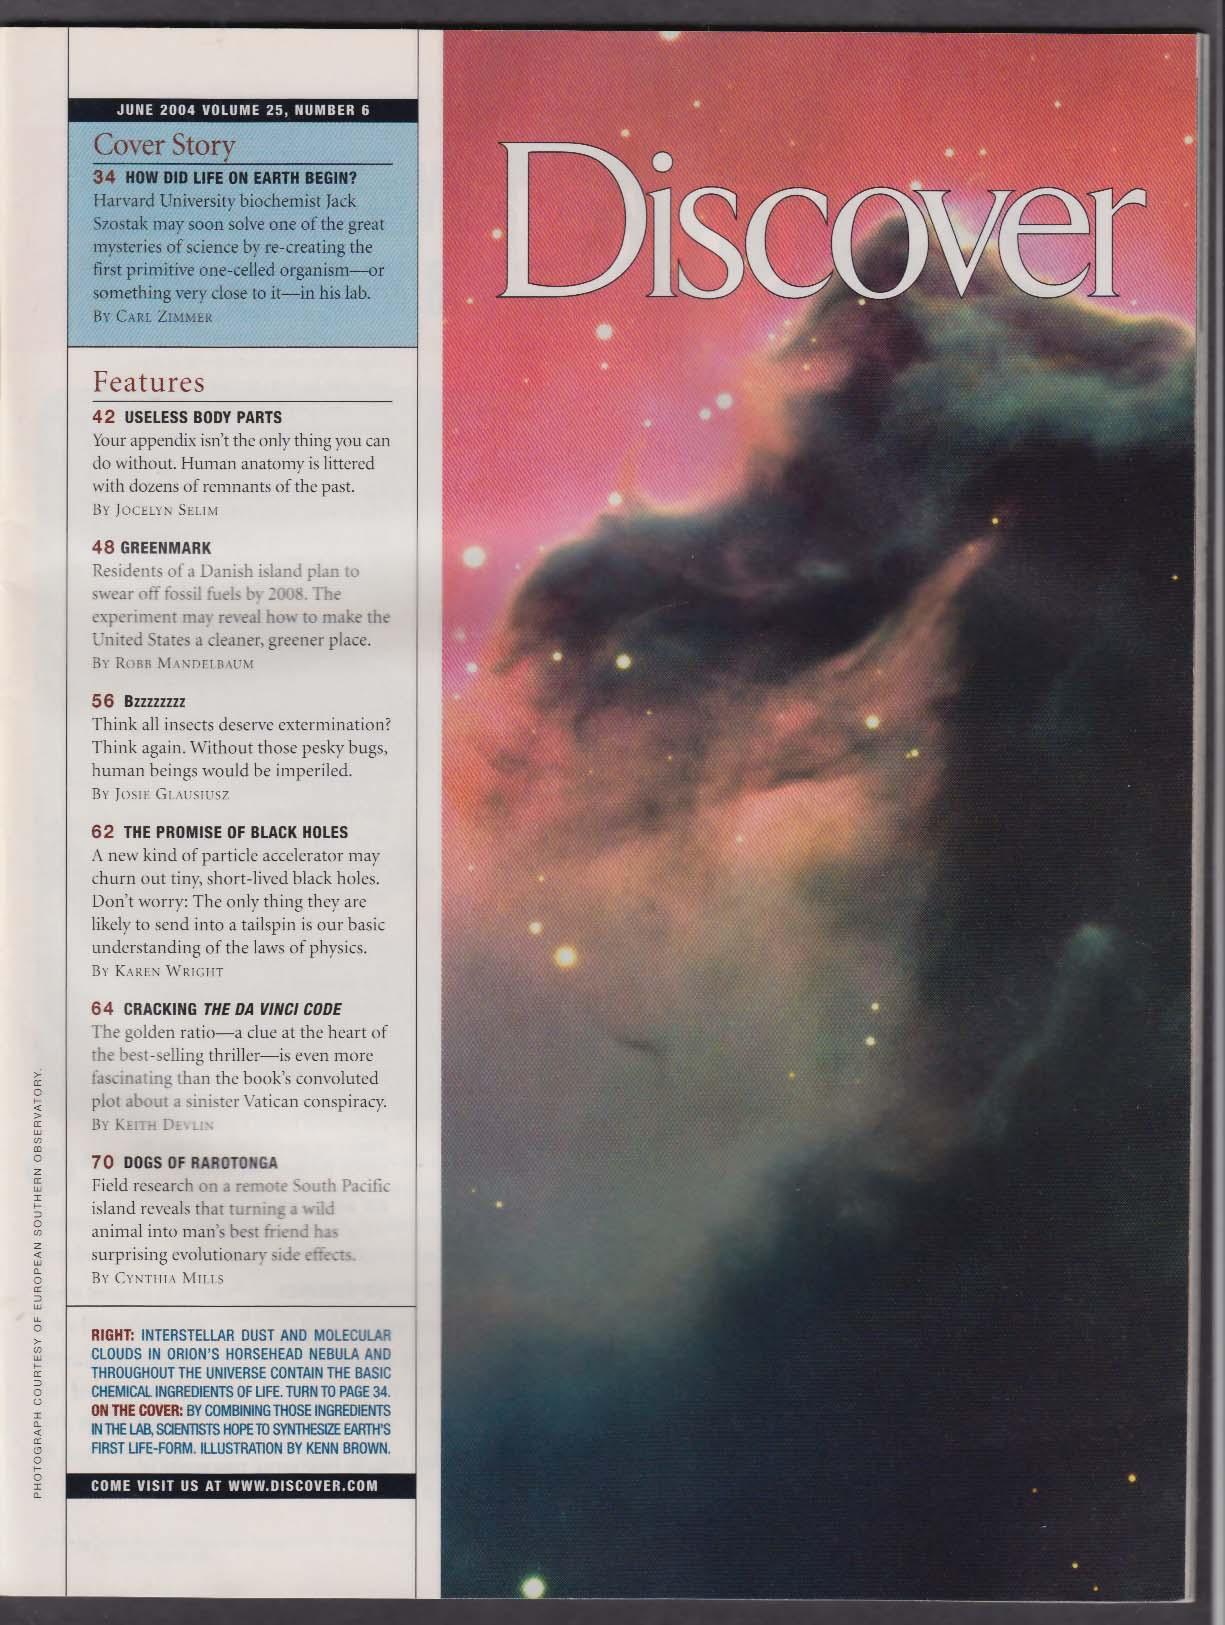 DISCOVER Before DNA? Black holes Da Vinci Code; short-leg dogs ...